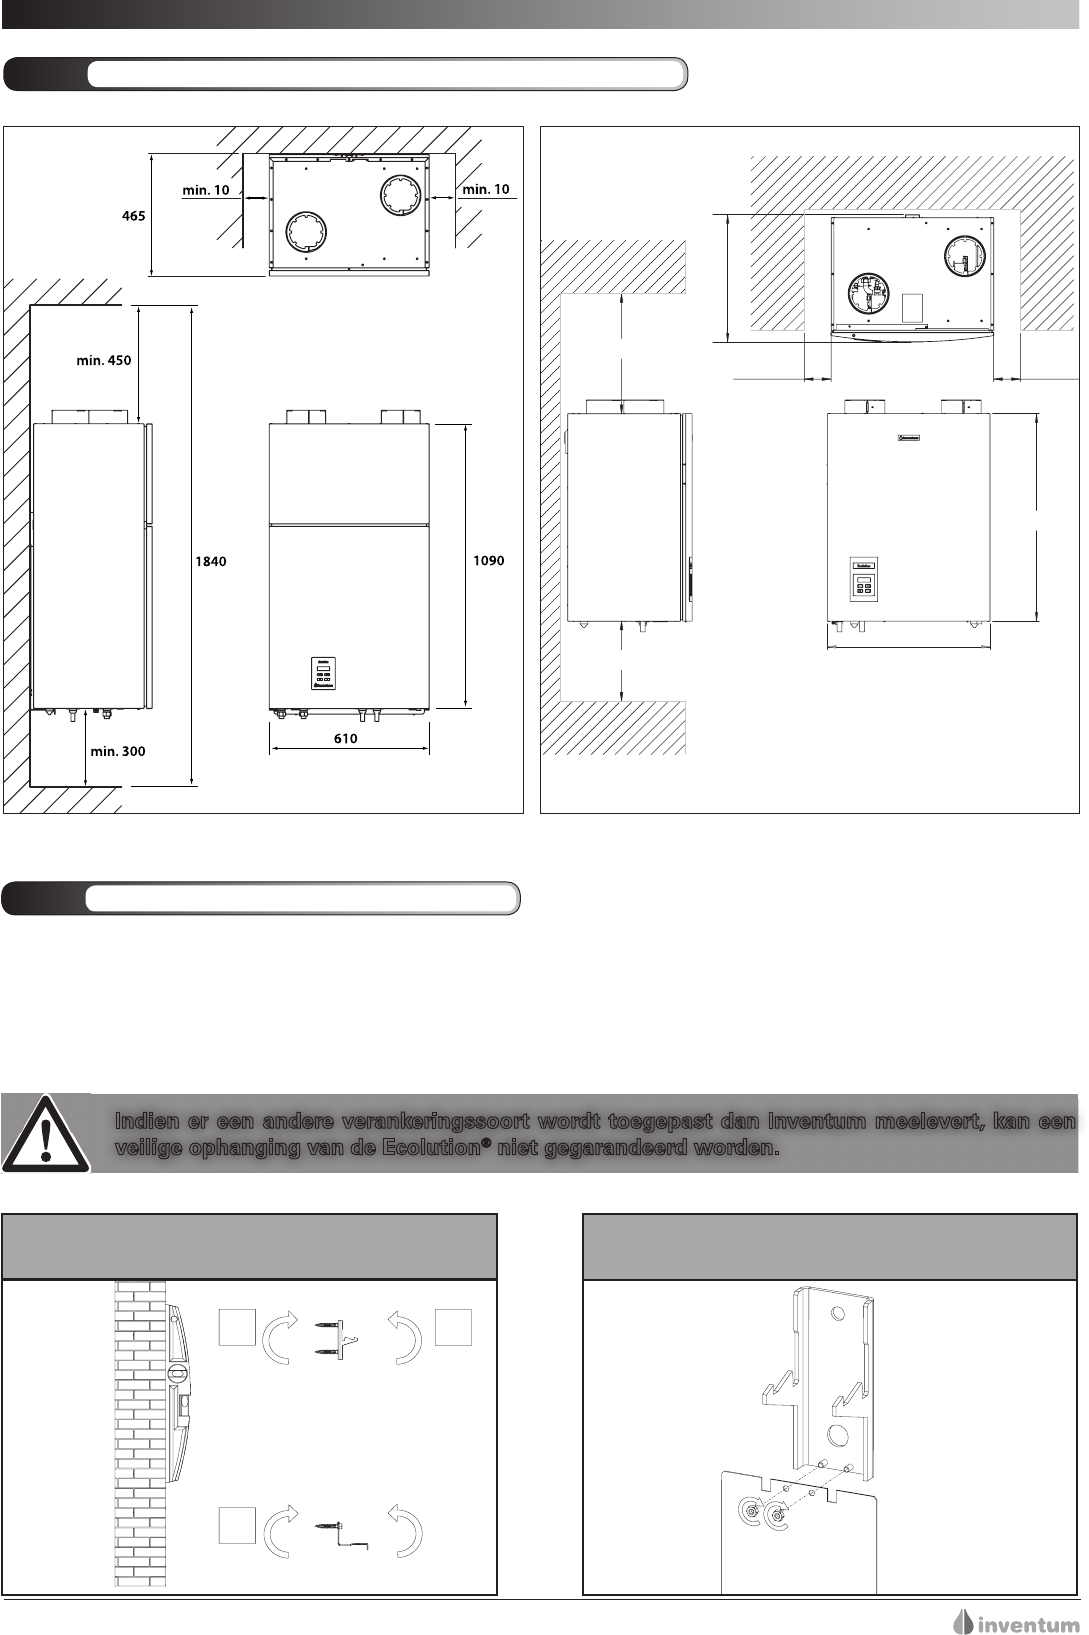 handleiding inventum ecolution combi 50  pagina 19 van 53